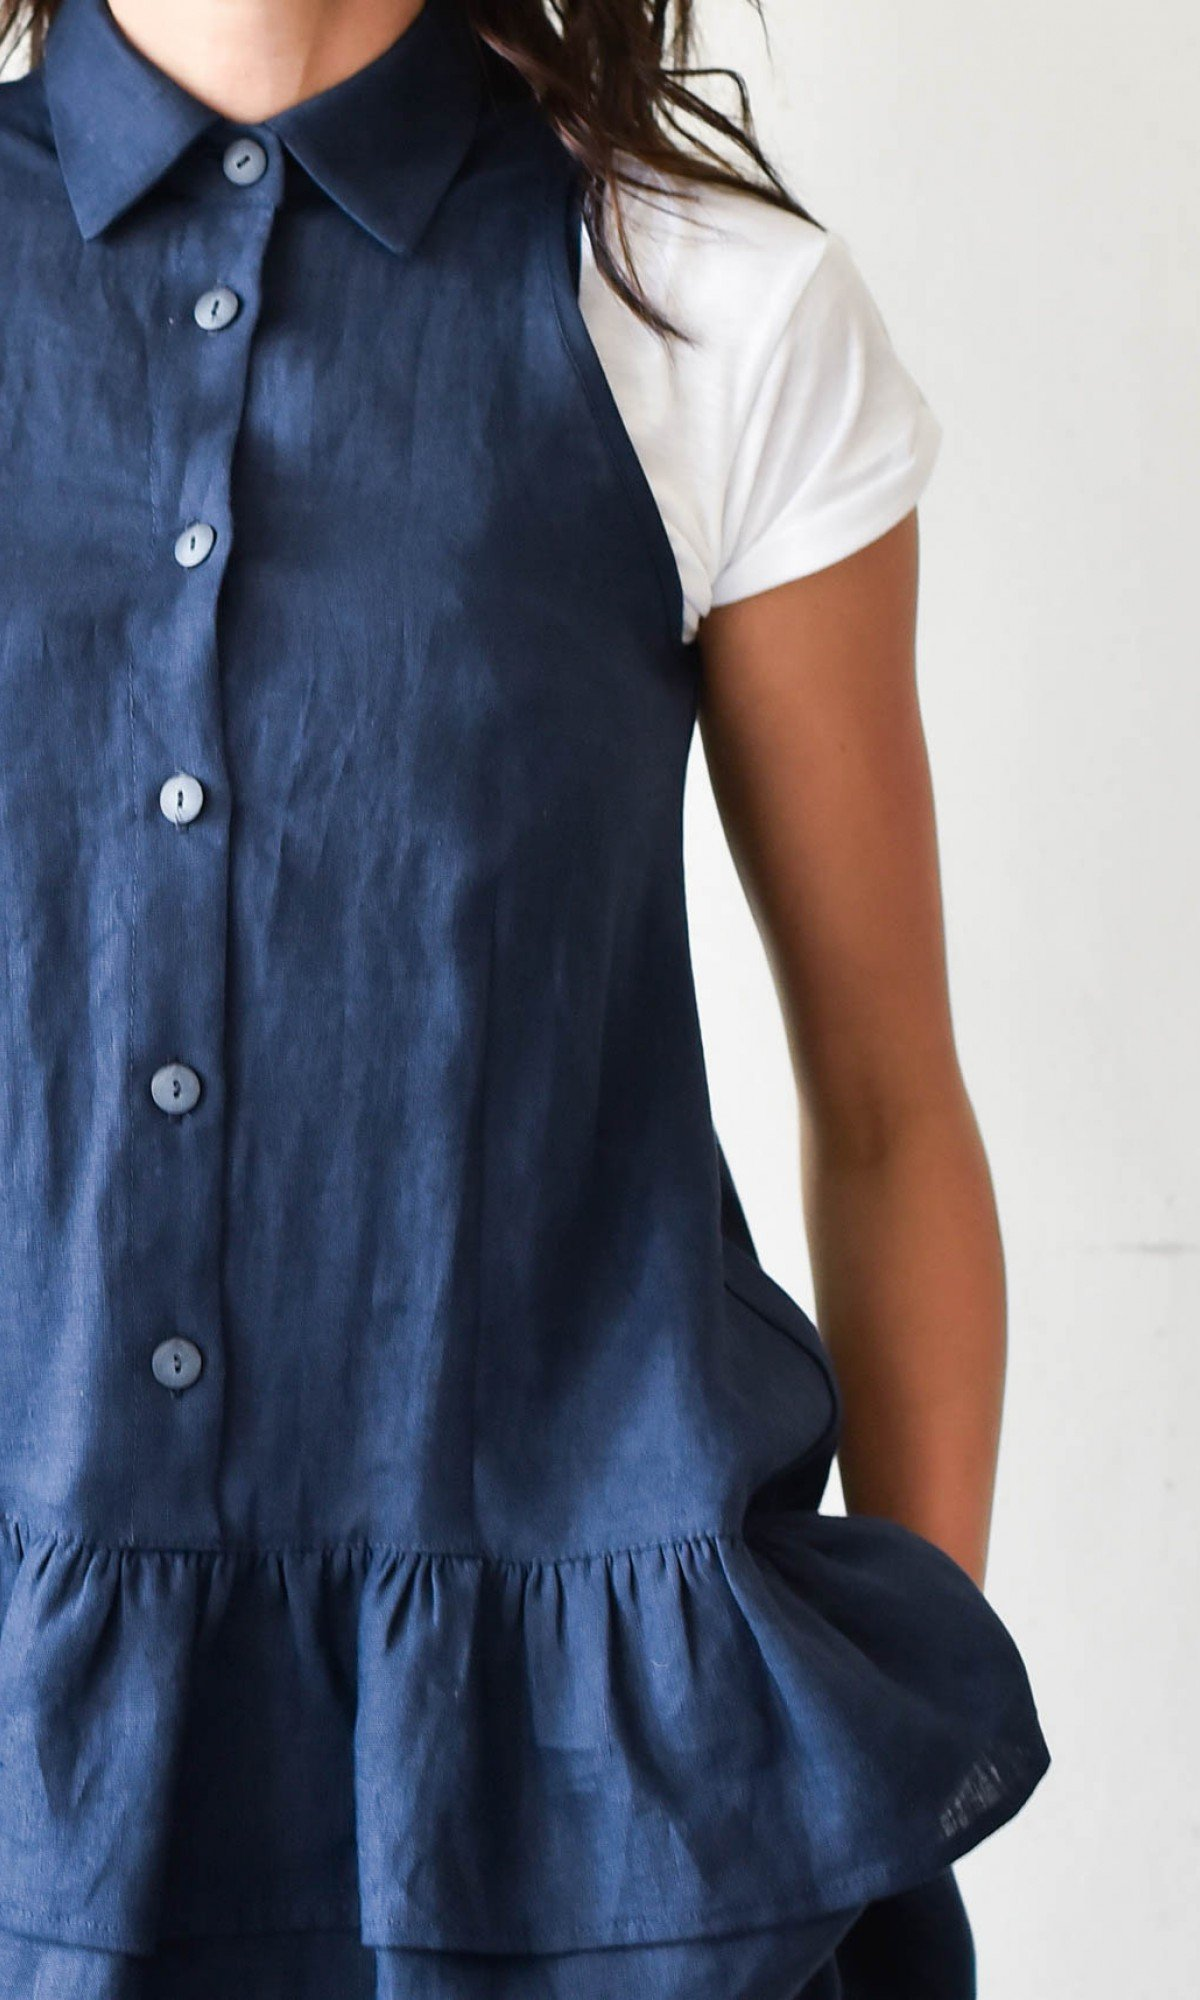 Aakasha New Sleeveless Linen top with frills A90287